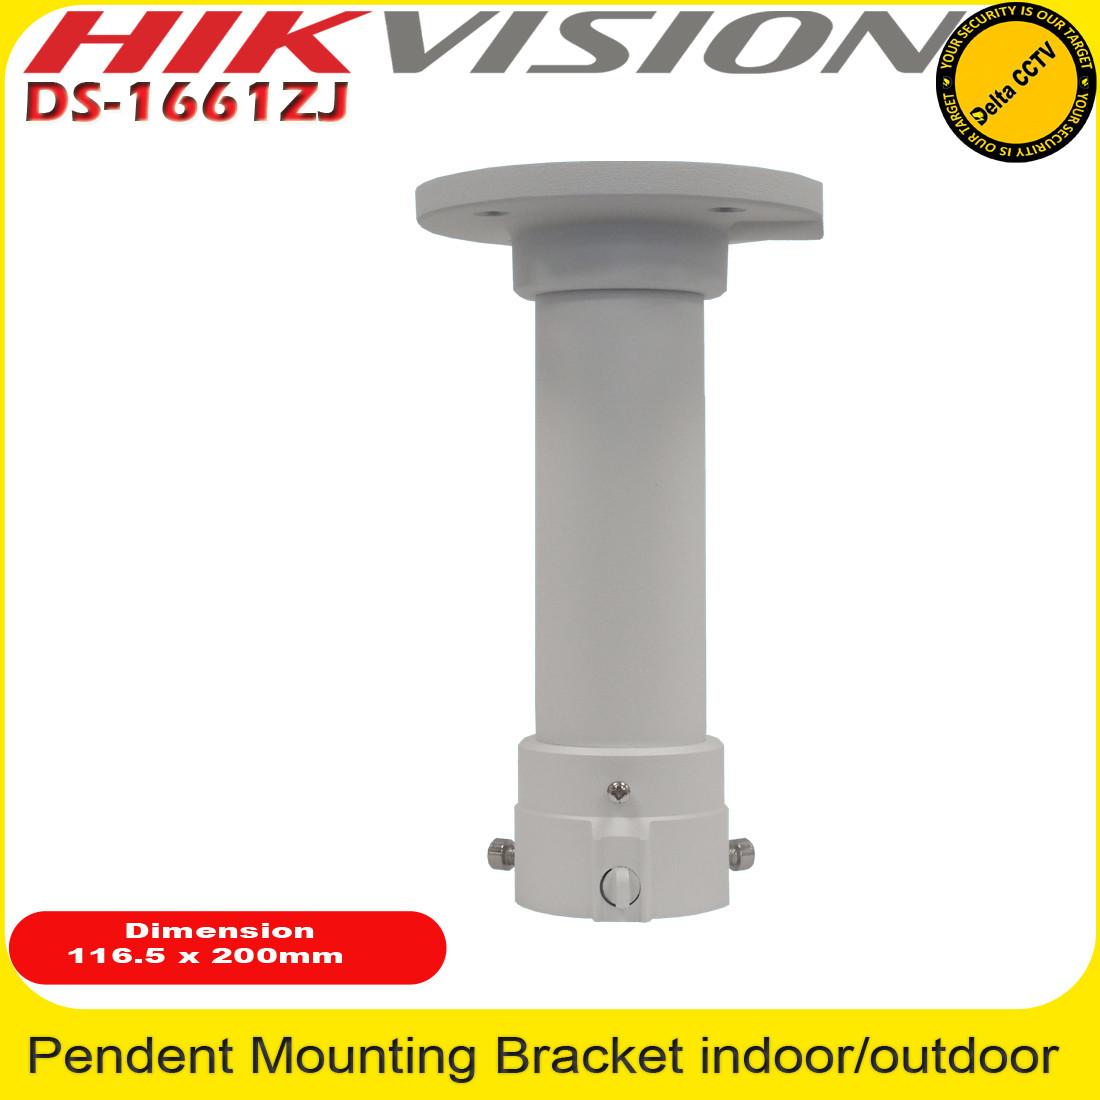 HIKVISON US VERSION DS-1661ZJ Mounting Bracket in-Outdoor